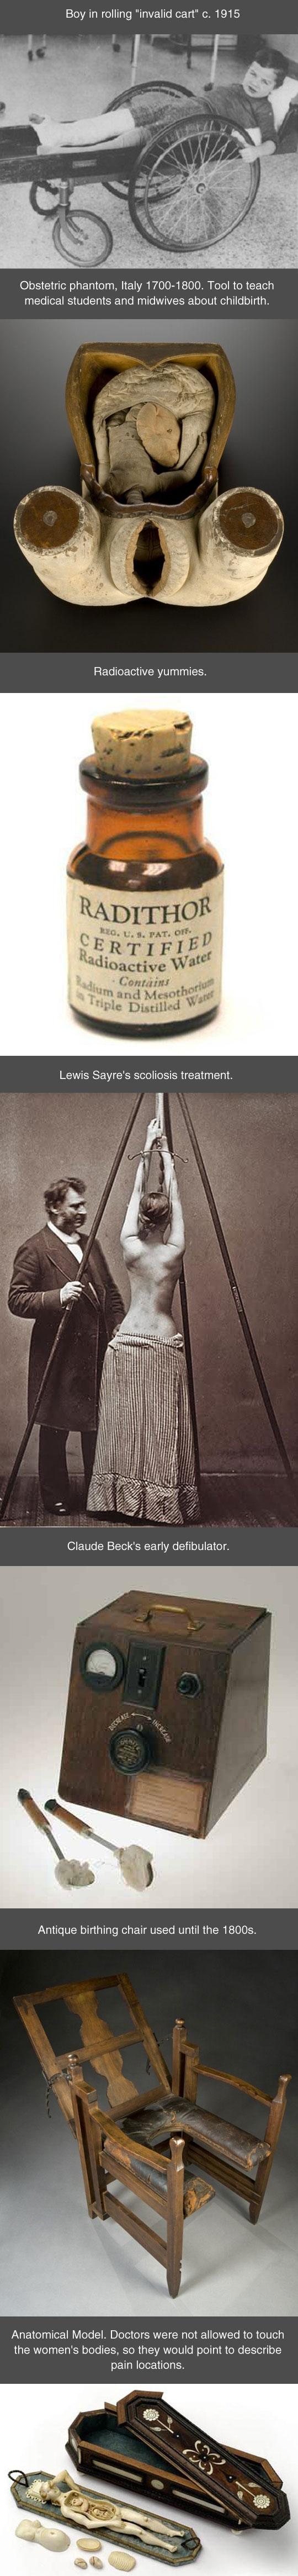 cool-old-medical-images-birth-method